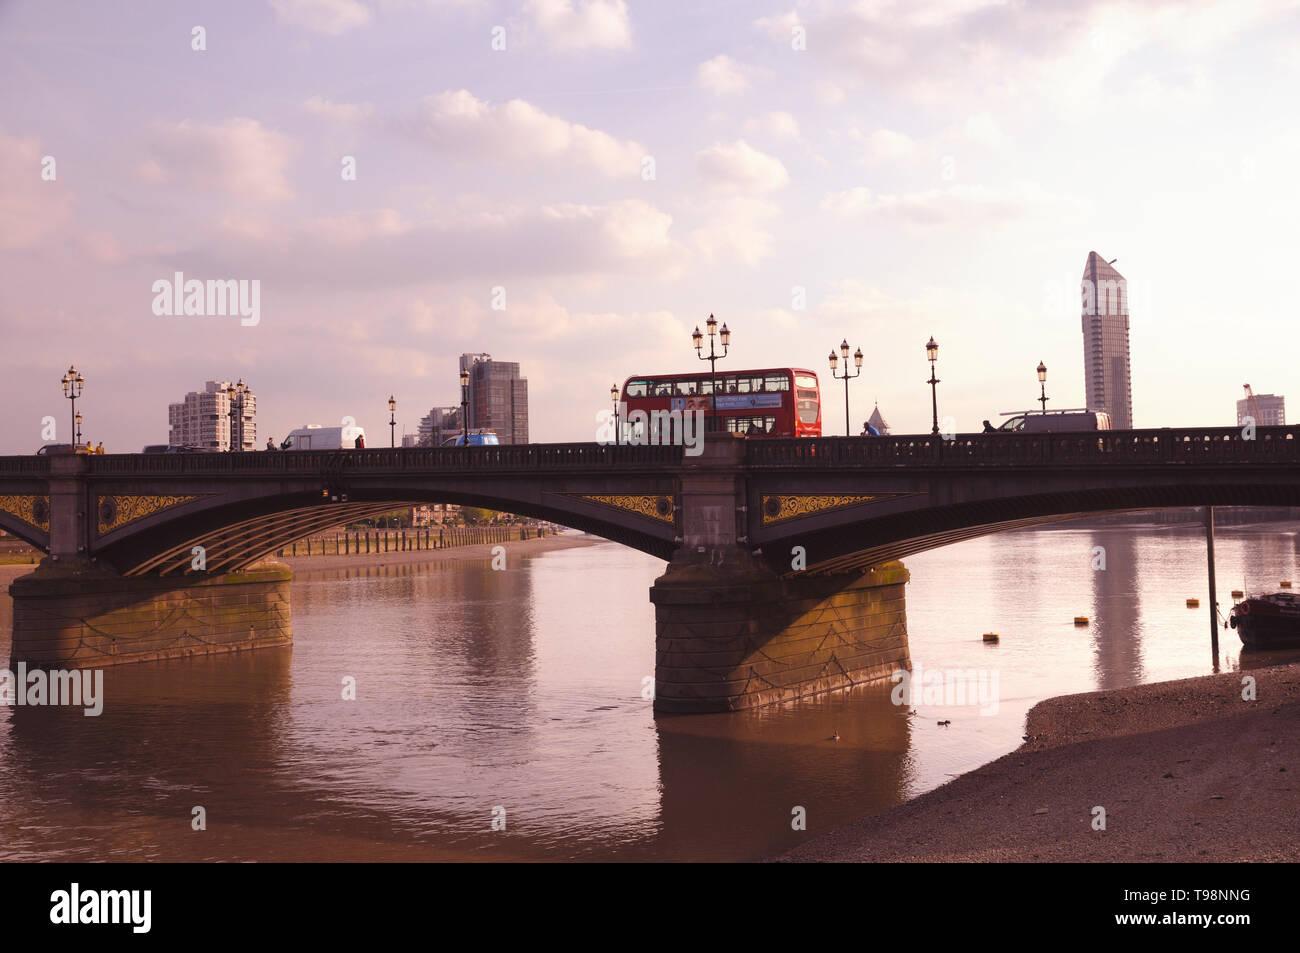 A red double-decker bus on Battersea Bridge crossing the River Thames, Chelsea Embankment, London, England, UK Stock Photo